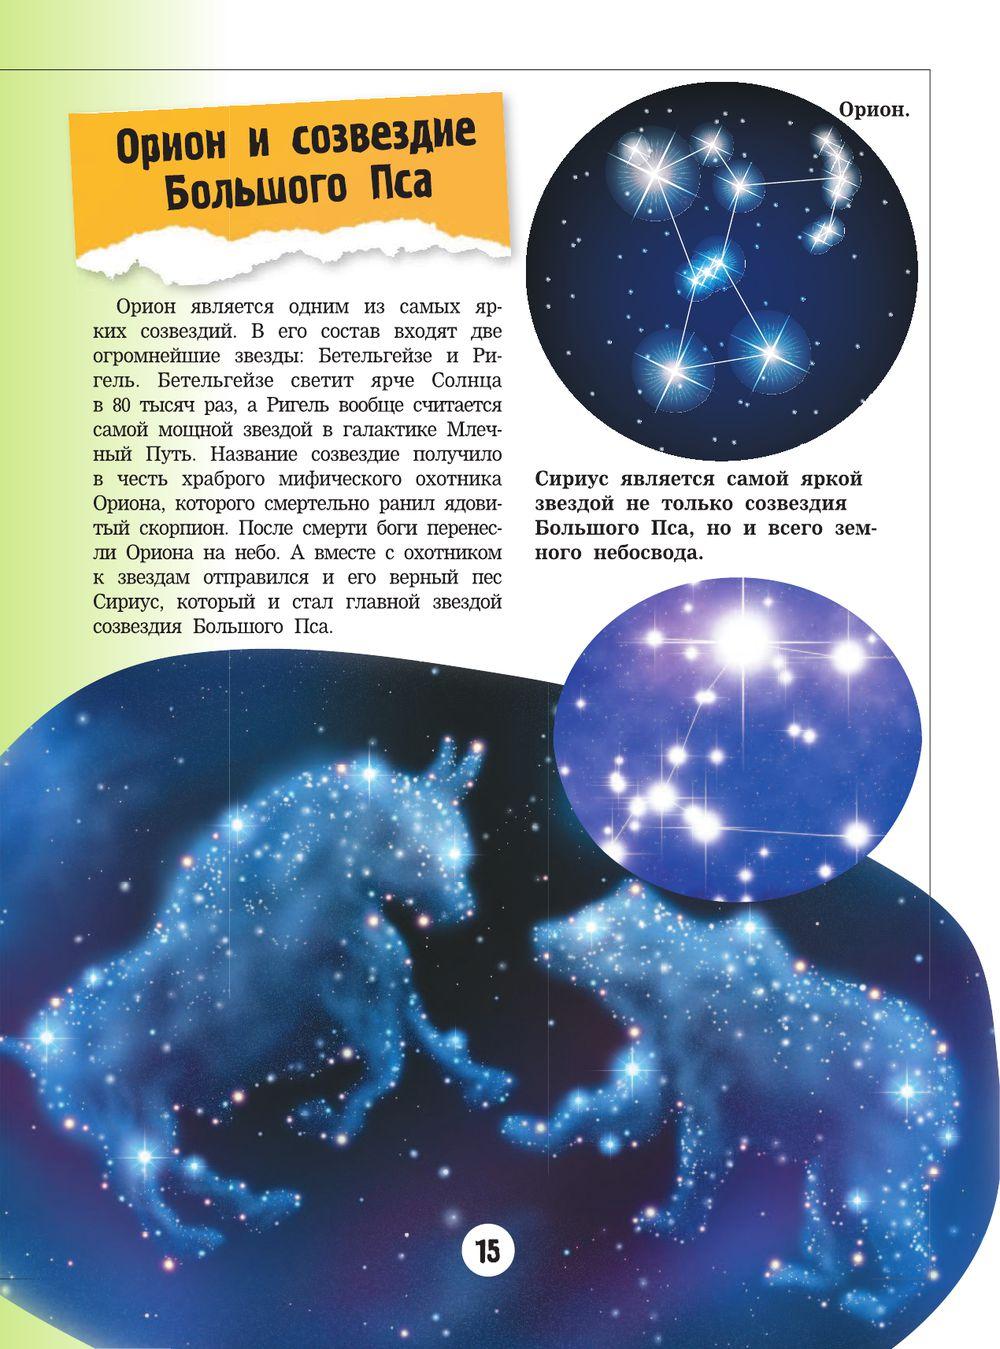 компьютер уже созвездие орион на небе характеристики